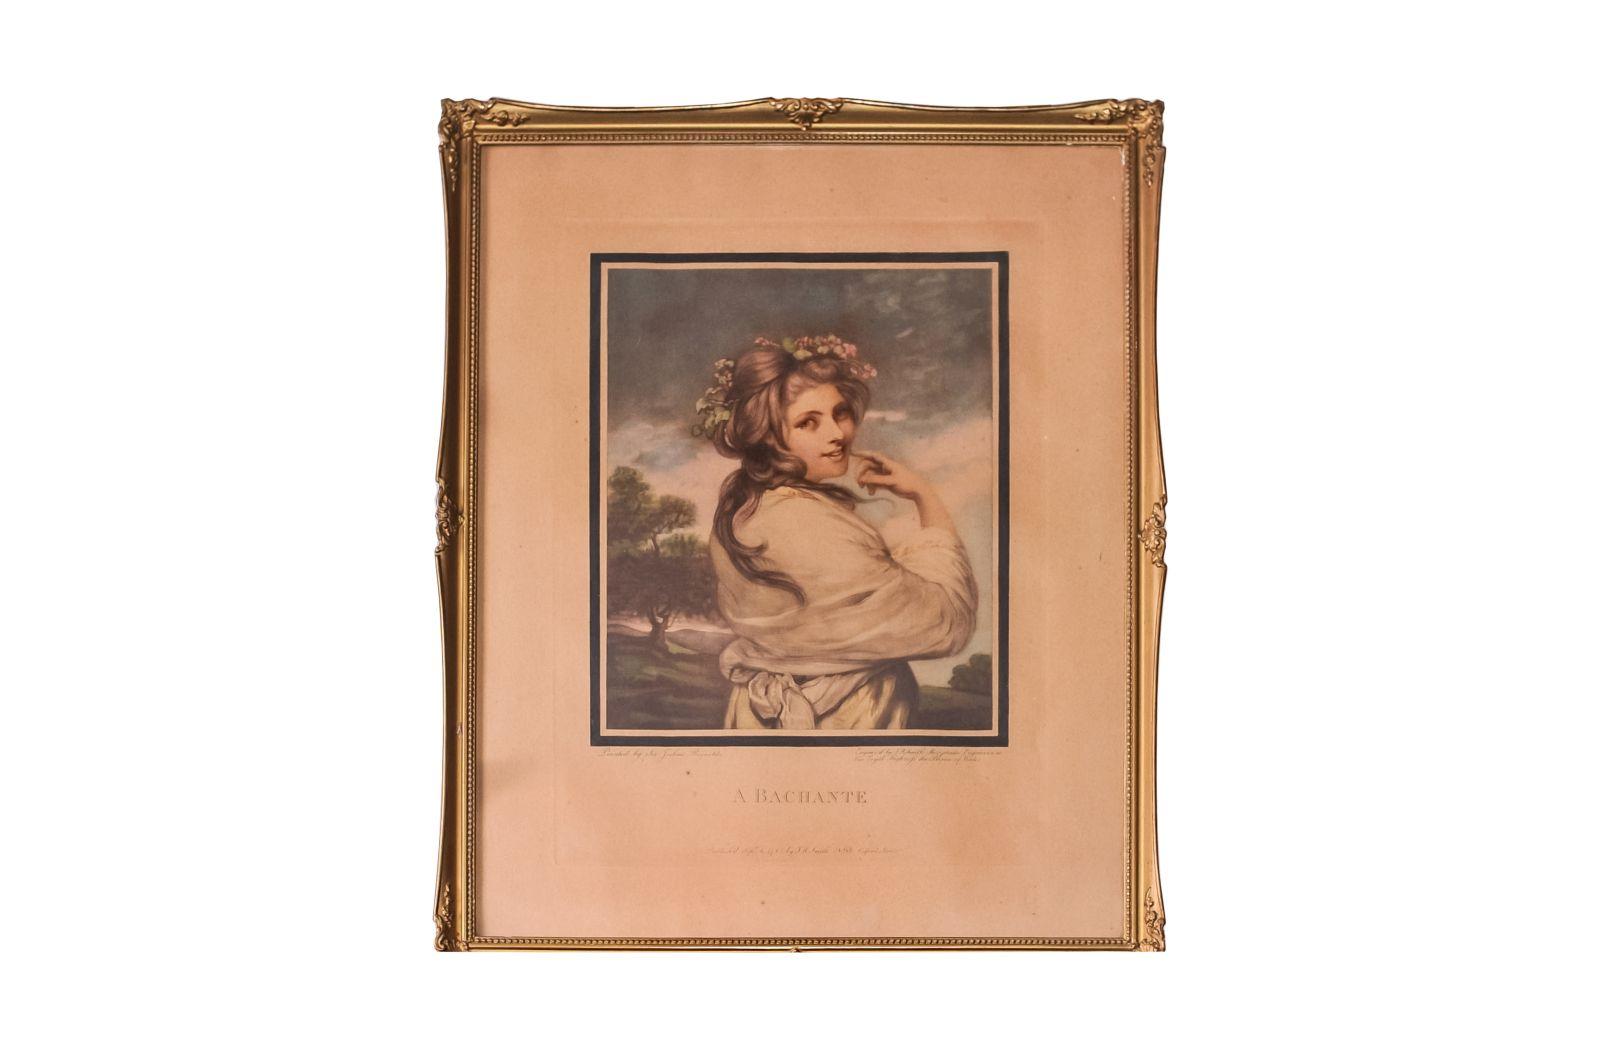 #68 J.R. Smith (1751-1812) Image